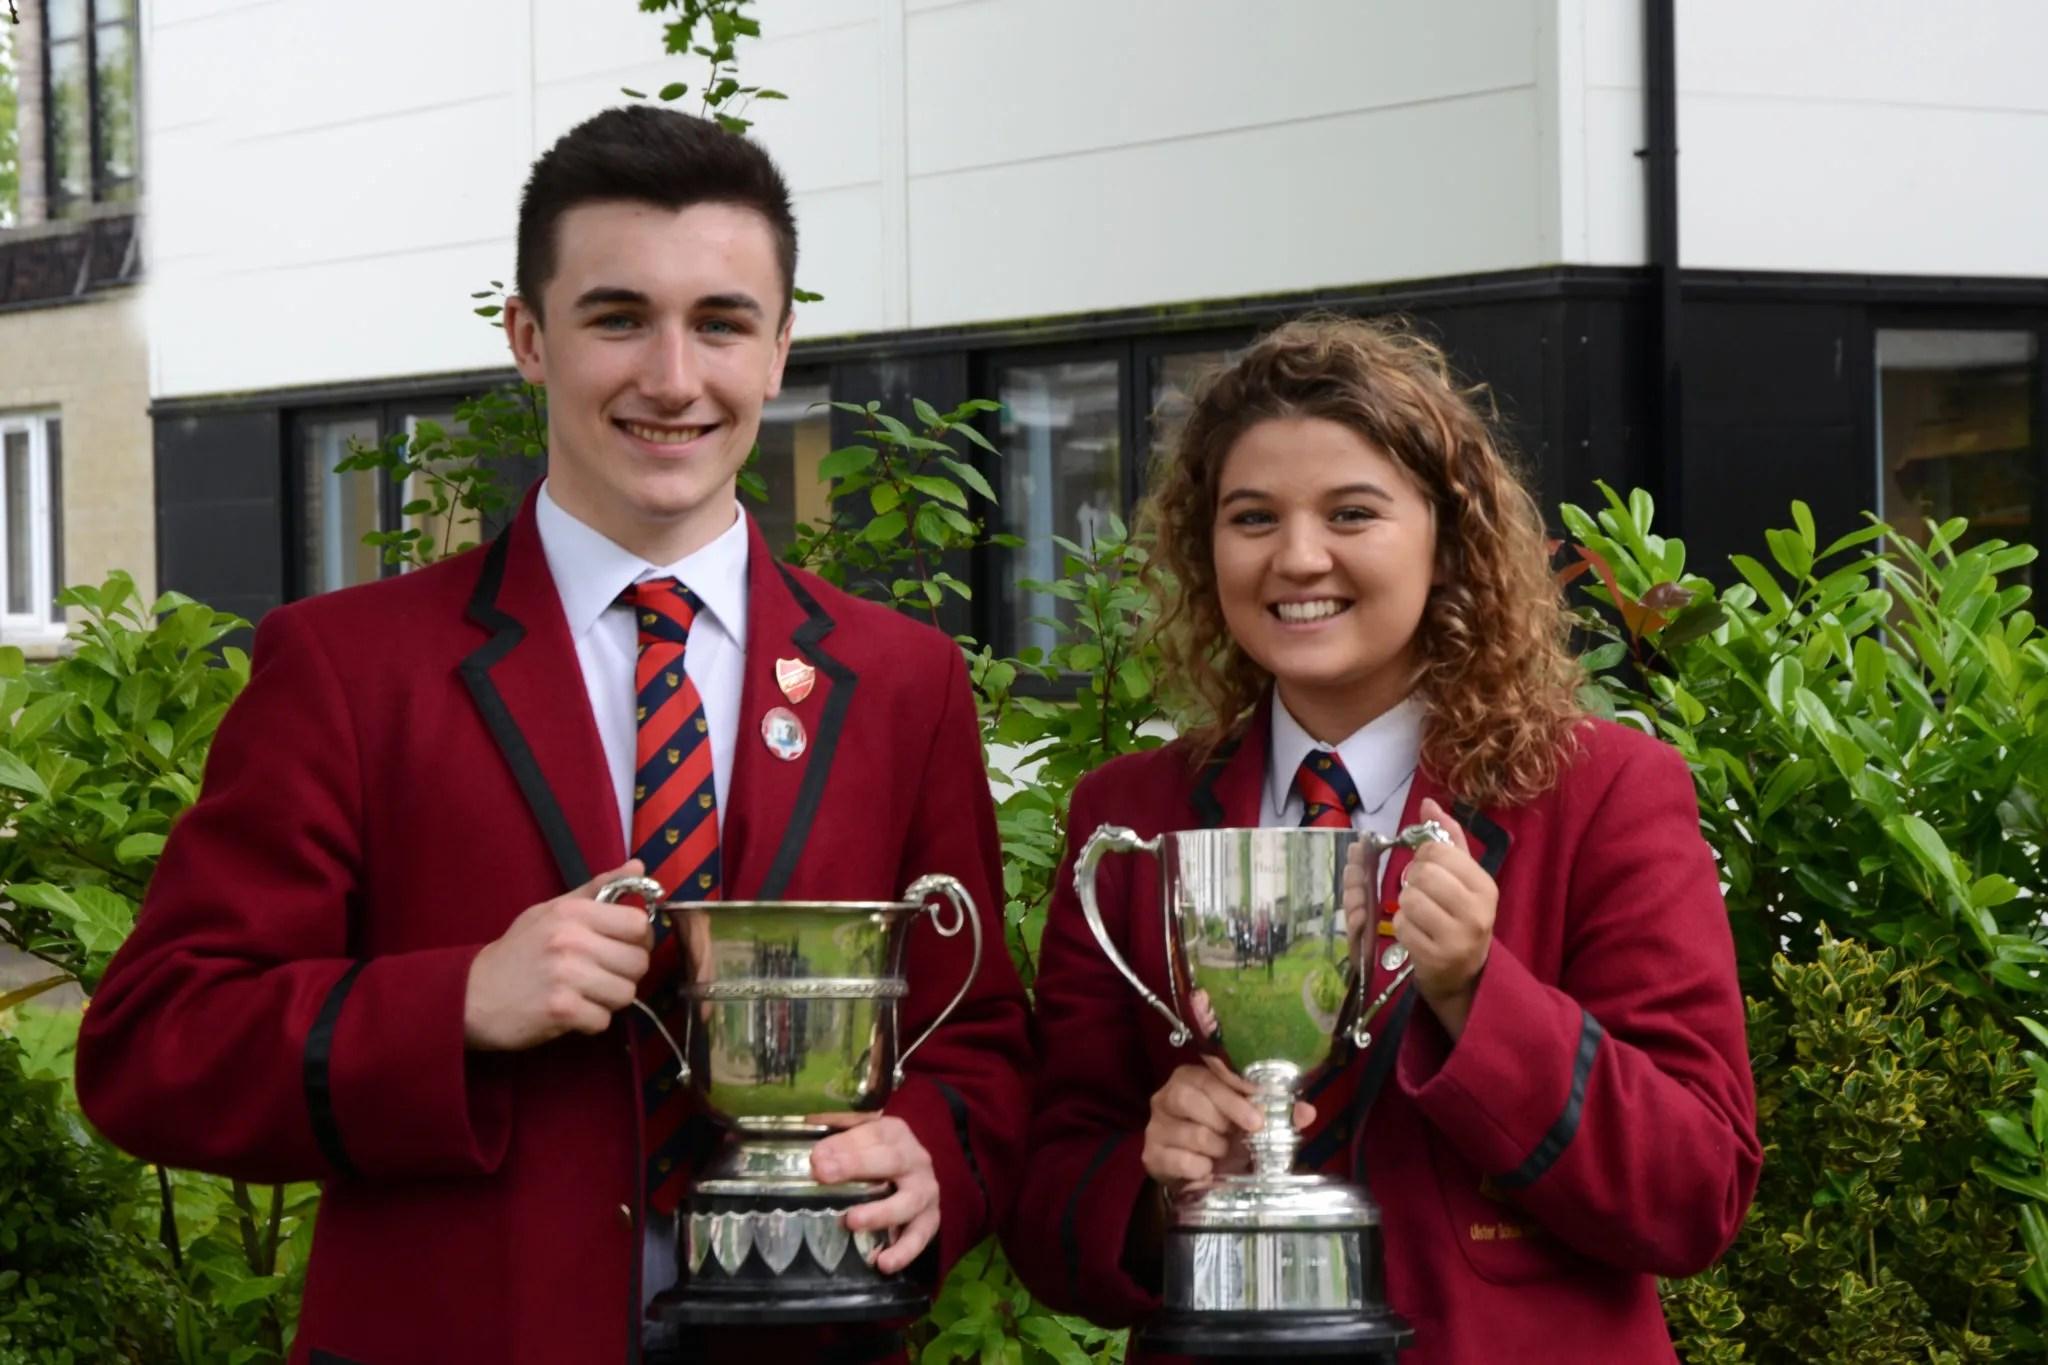 Ballyclare High School's Best Boy and Girl in Sport Jack Lewis and Jasmine Walker